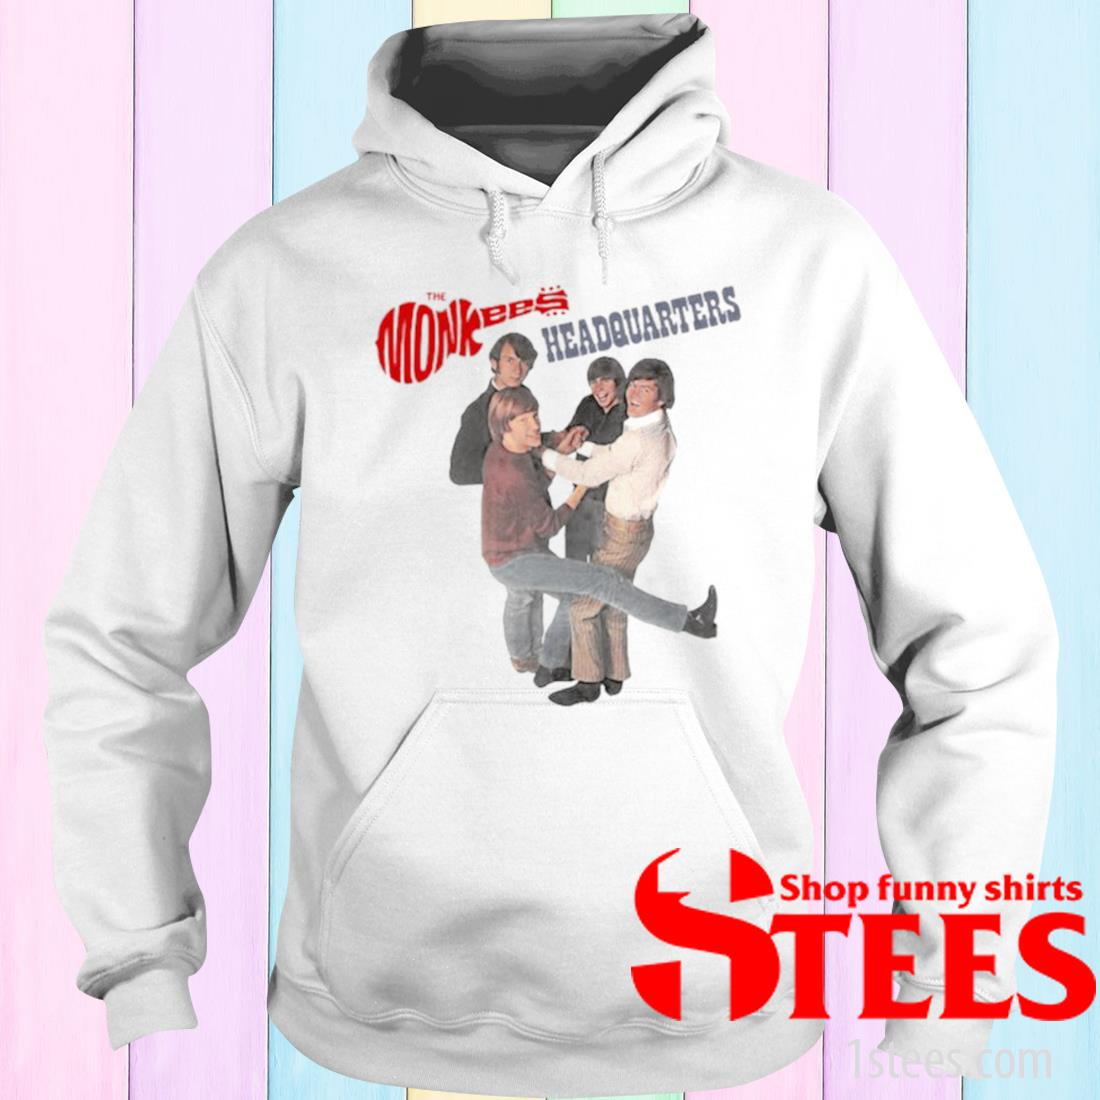 The Monkees Headquarters Shirt hoodie